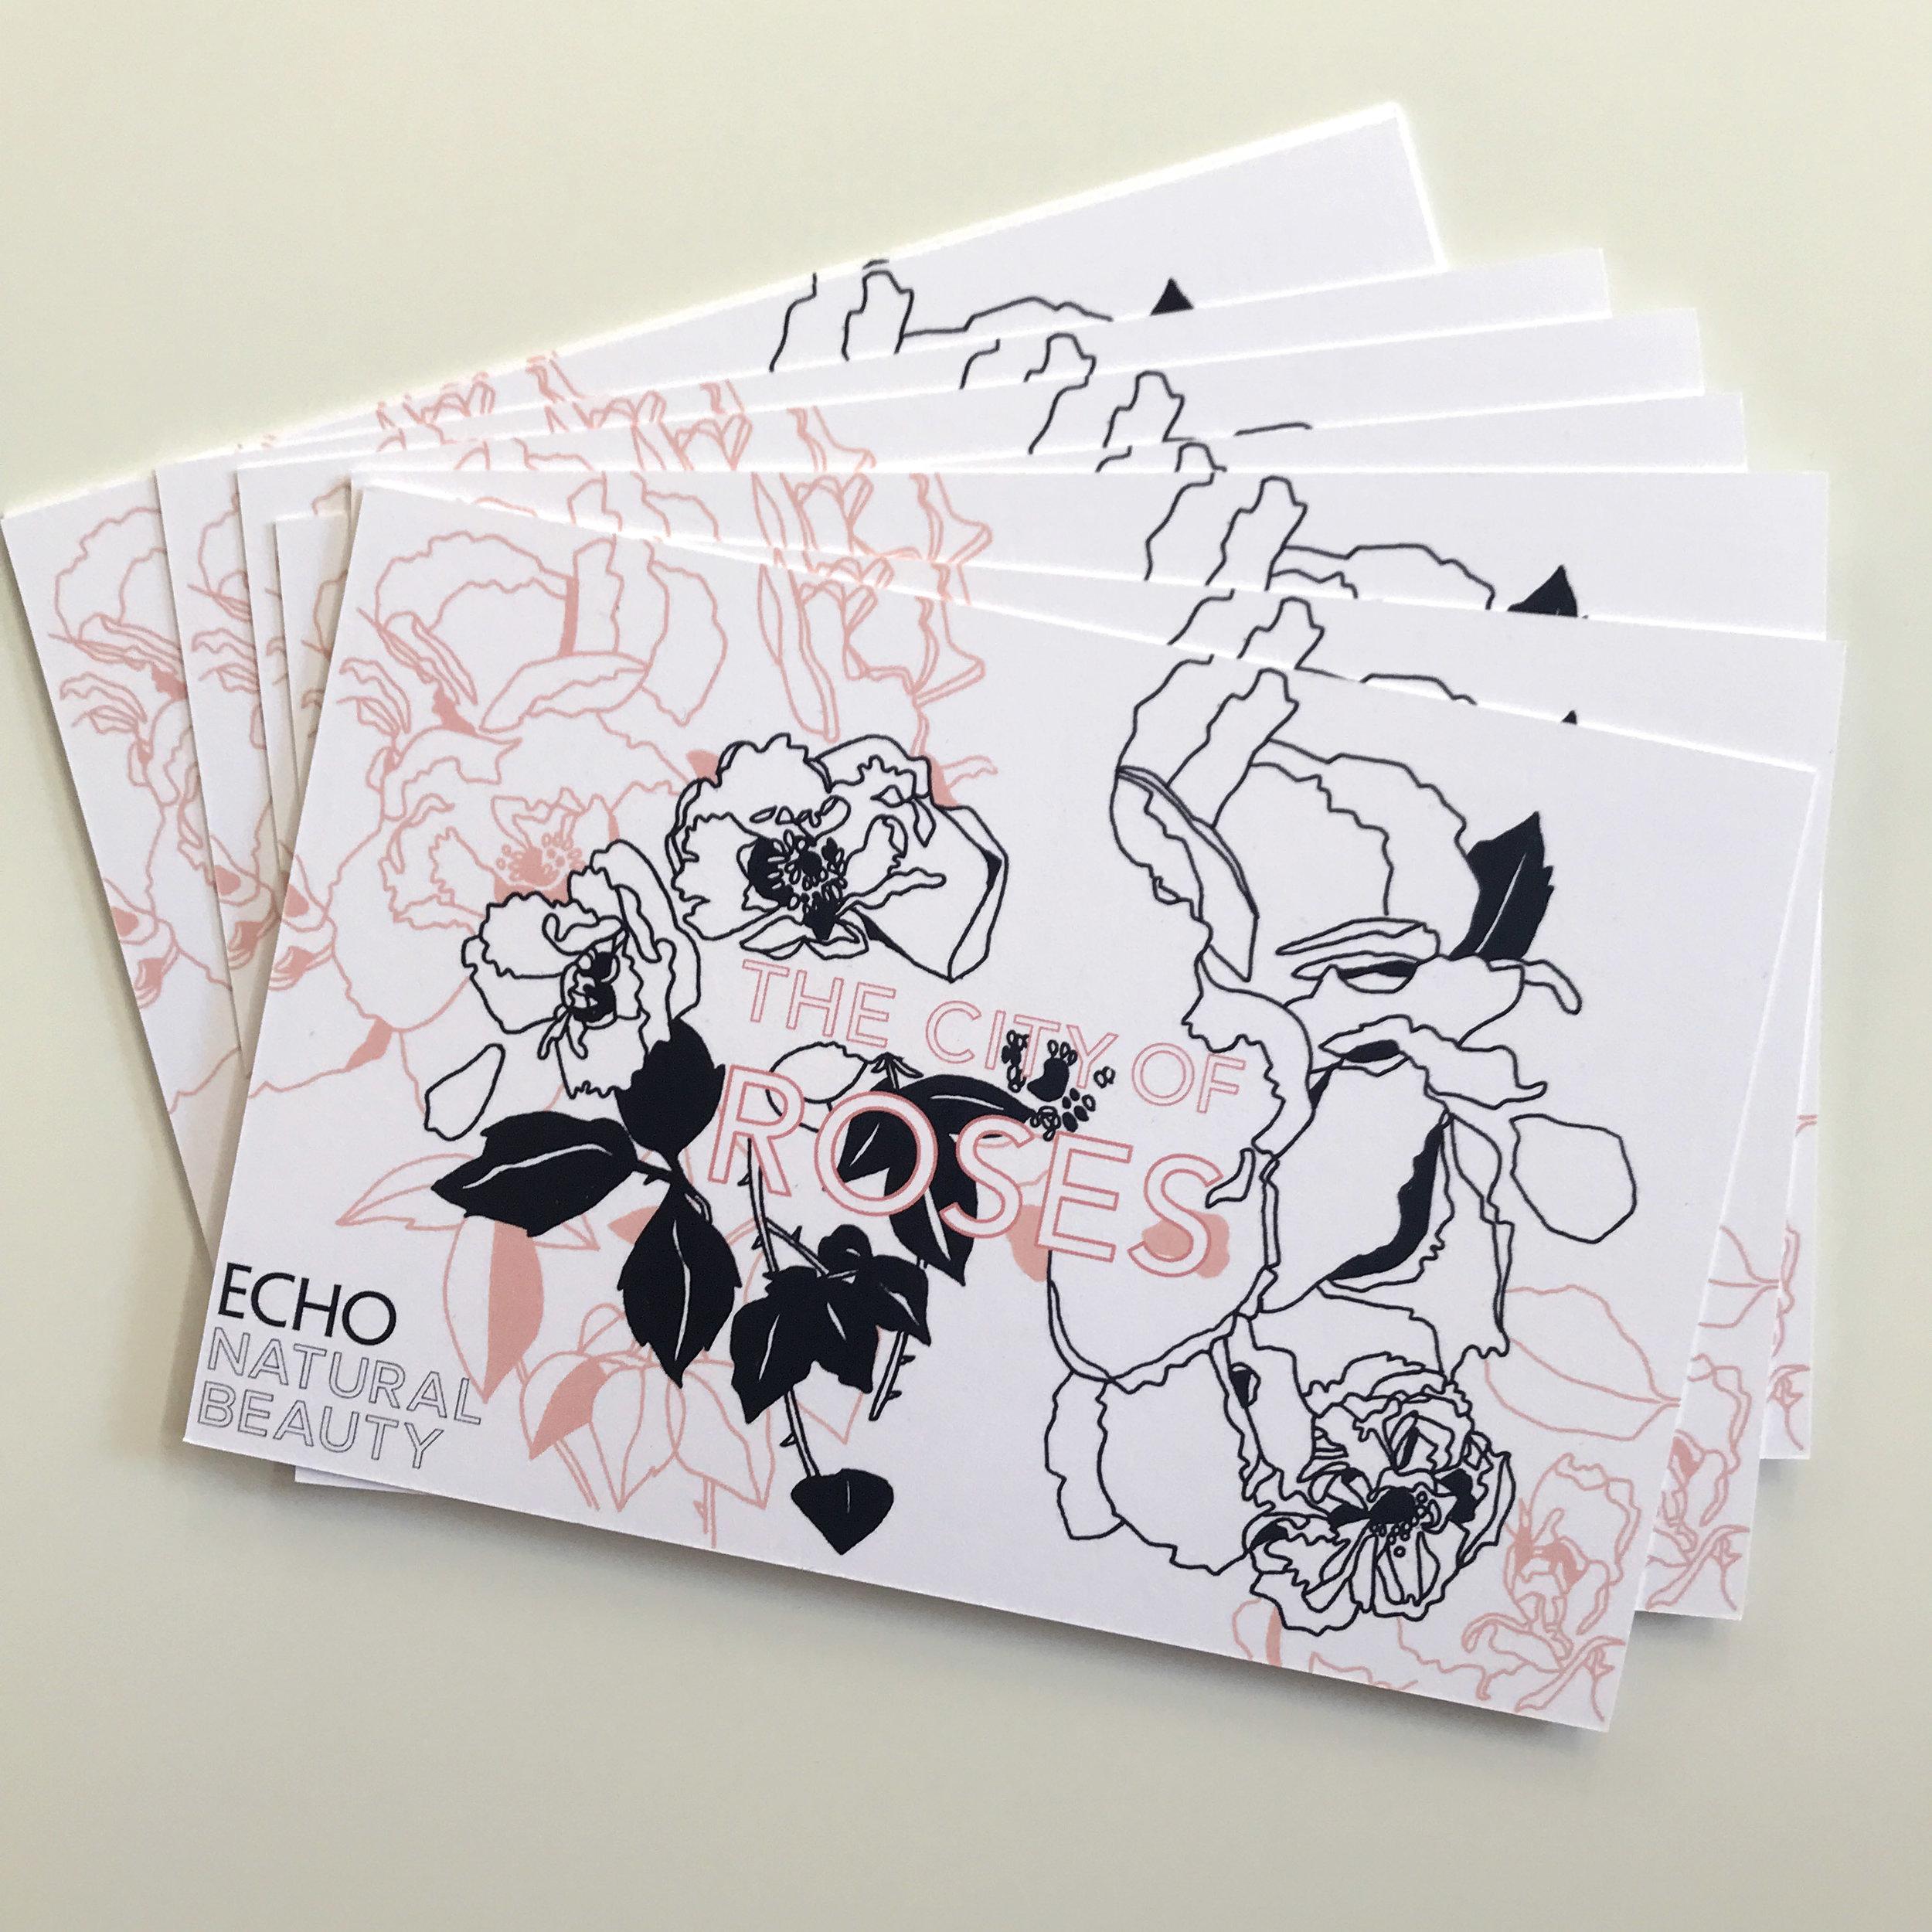 echo postcard stack photo.jpg